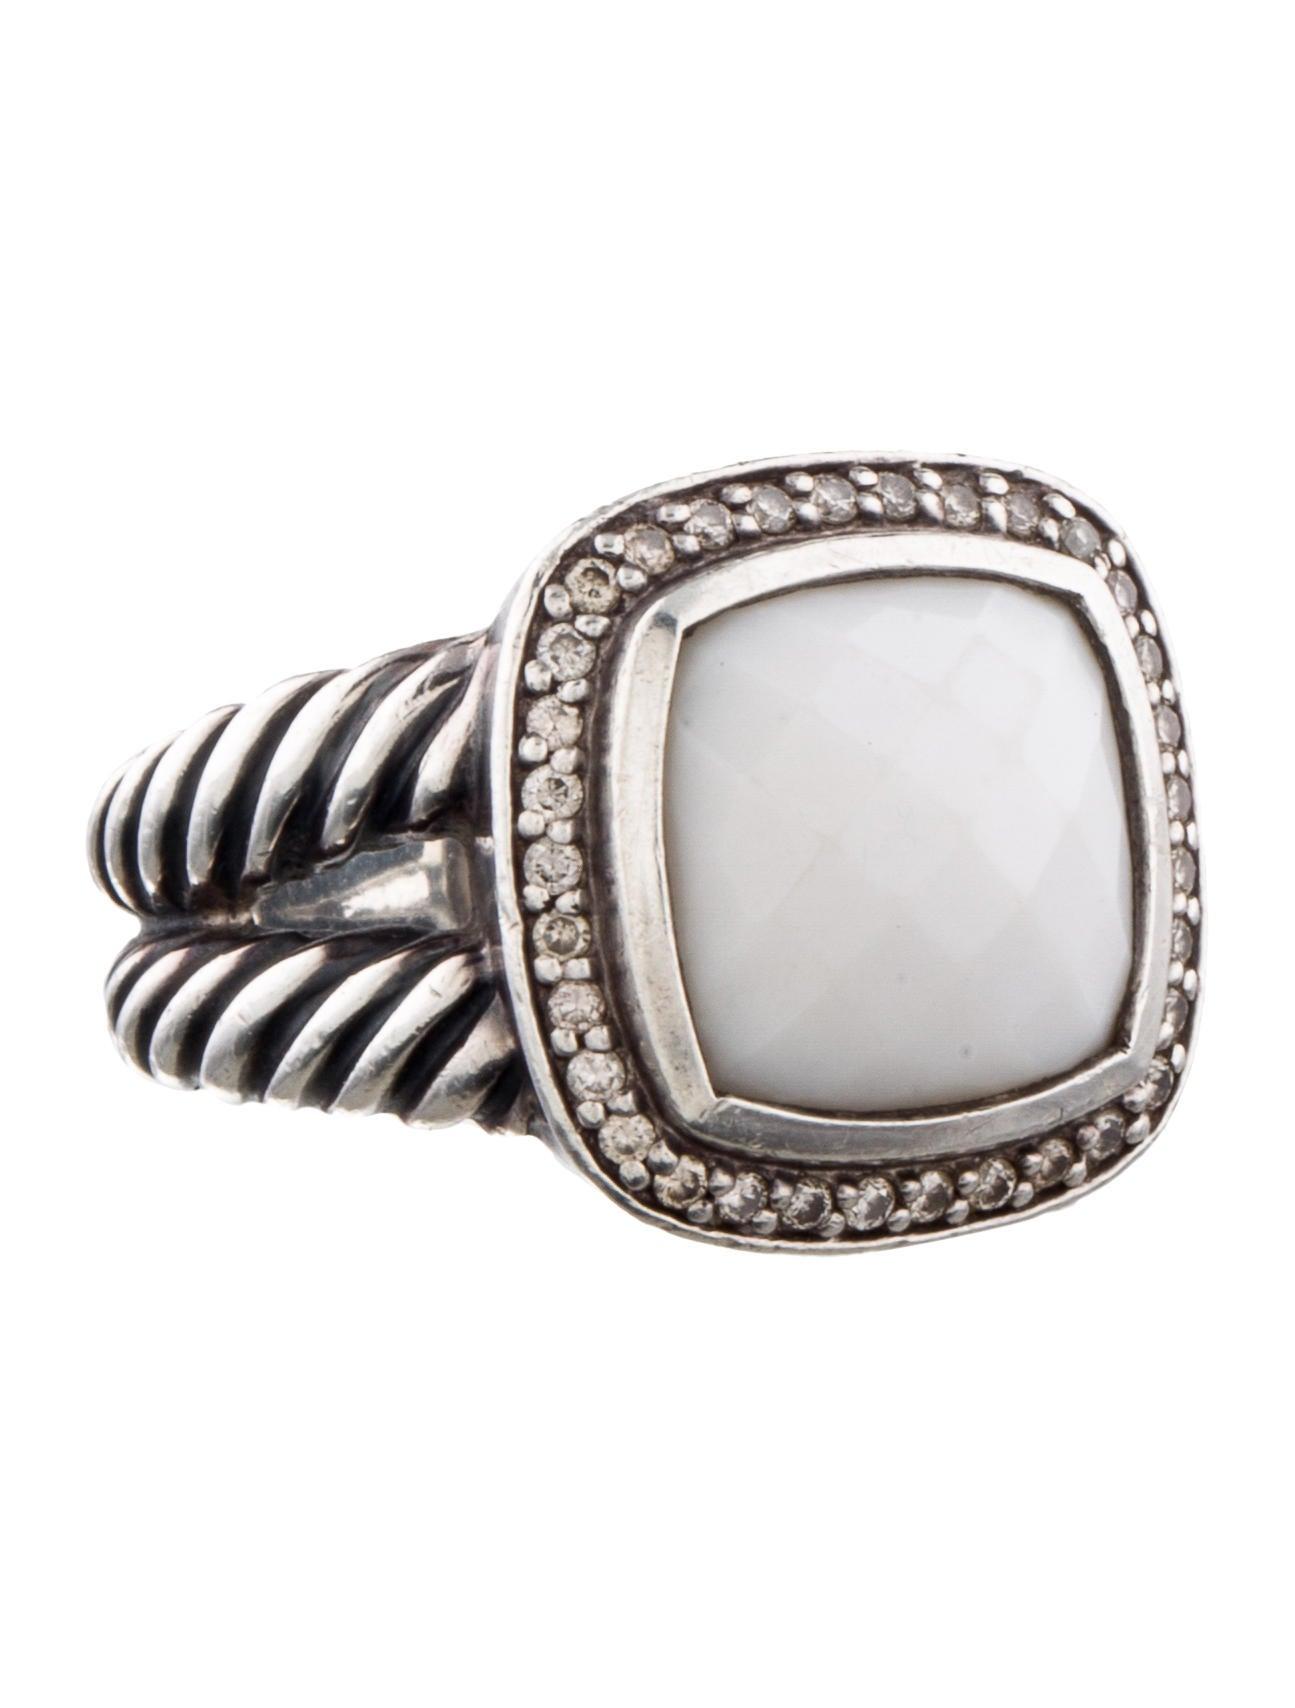 David yurman agate albion ring rings dvy29485 the for David yurman inspired jewelry rings